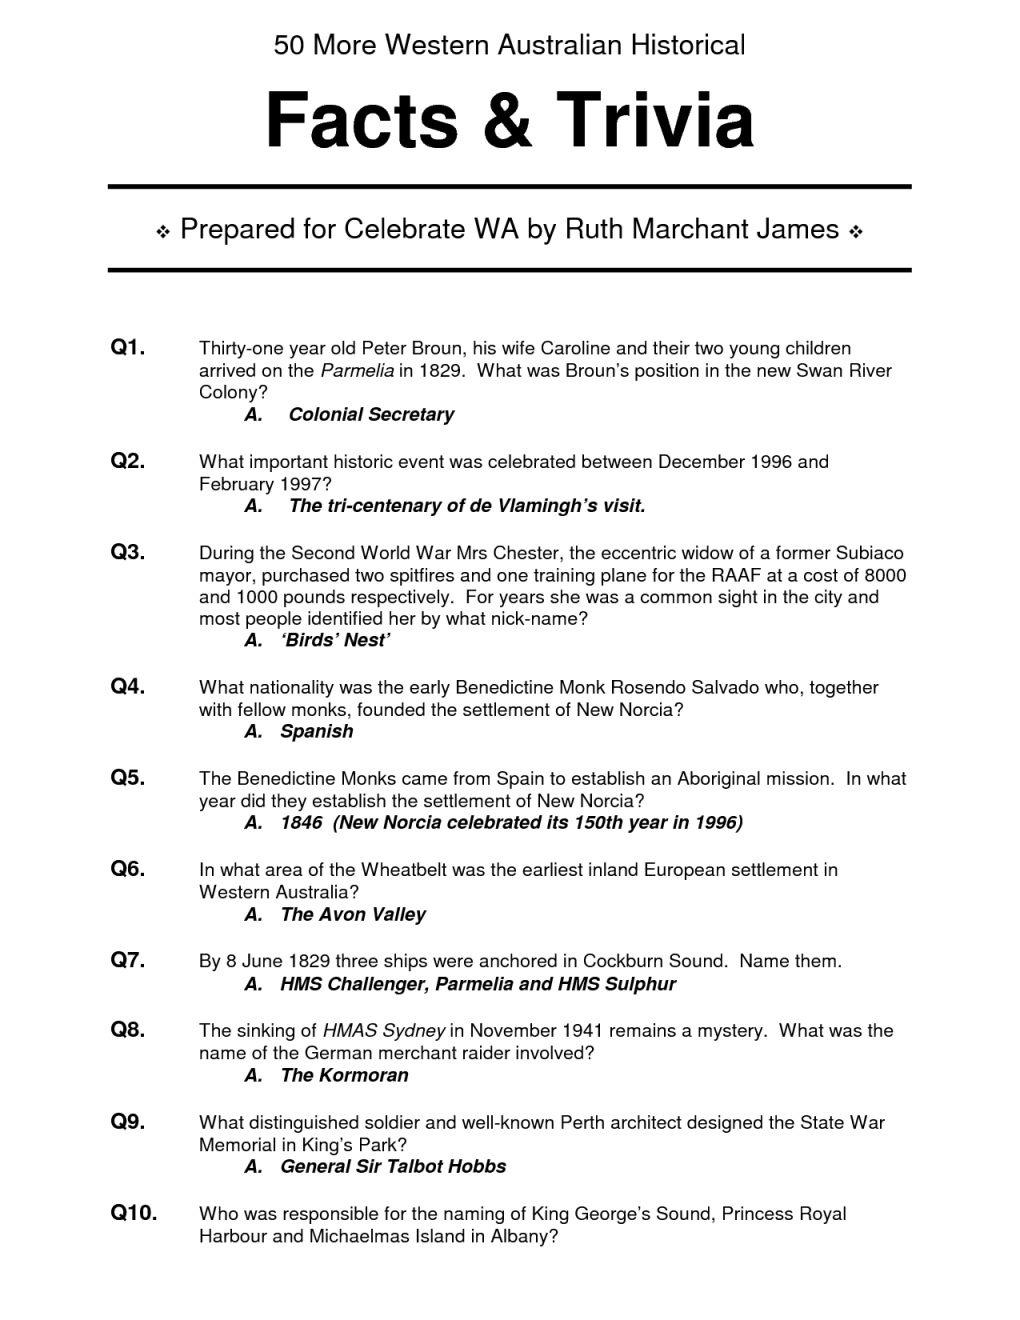 Free Printable Easy Christmas Trivia Questions And Answers - Free Printable Trivia Questions And Answers